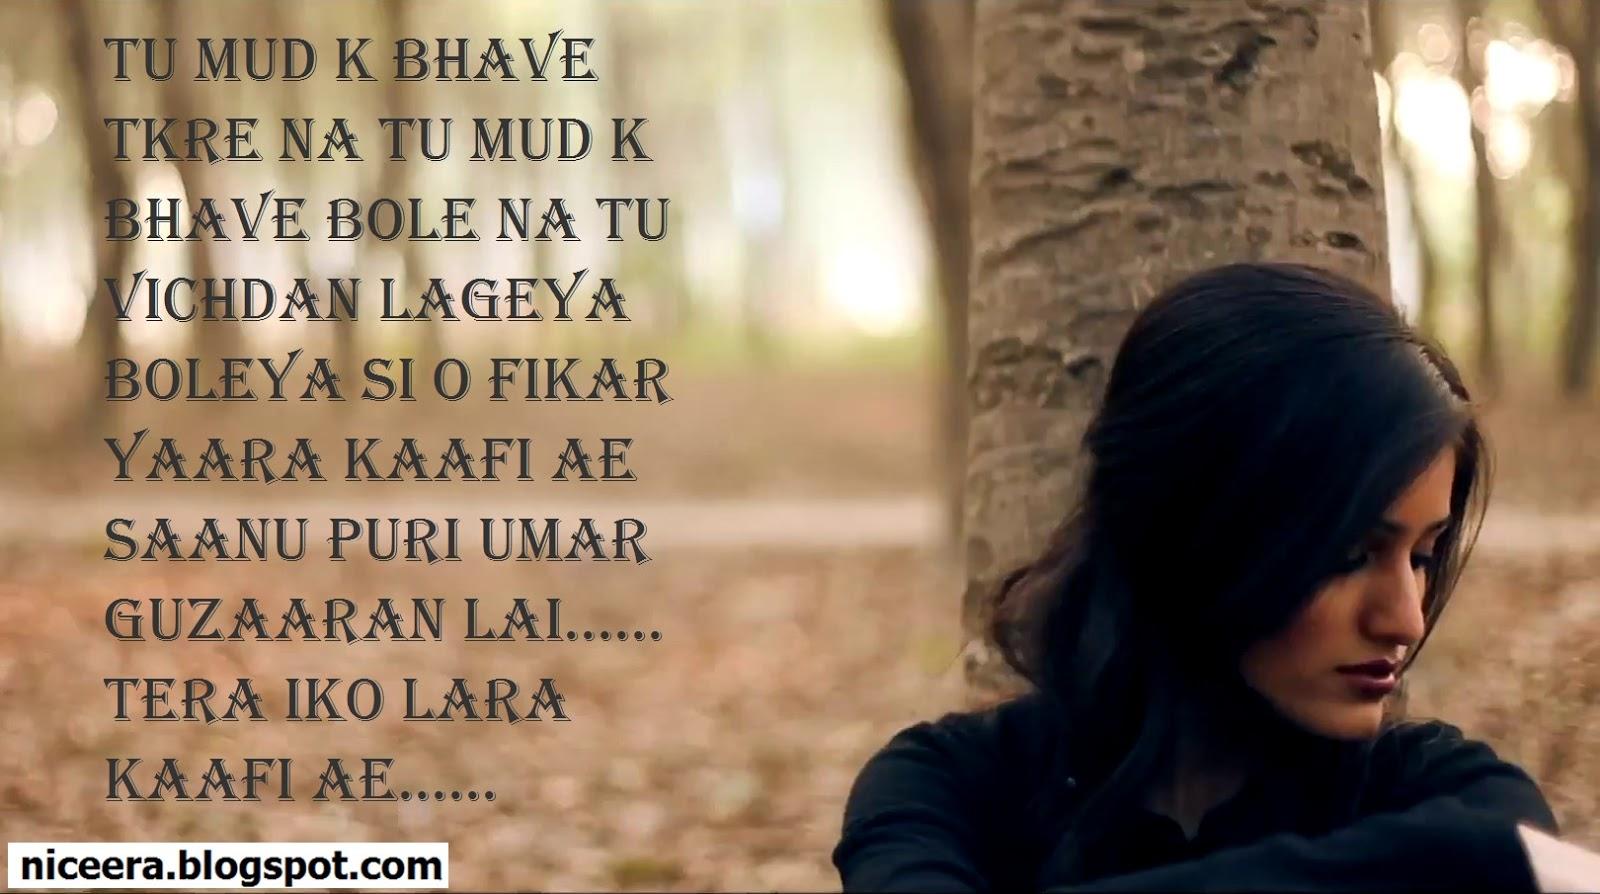 Punjabi Sad Shayari In Hindi - 1600x894 - Download HD Wallpaper -  WallpaperTip